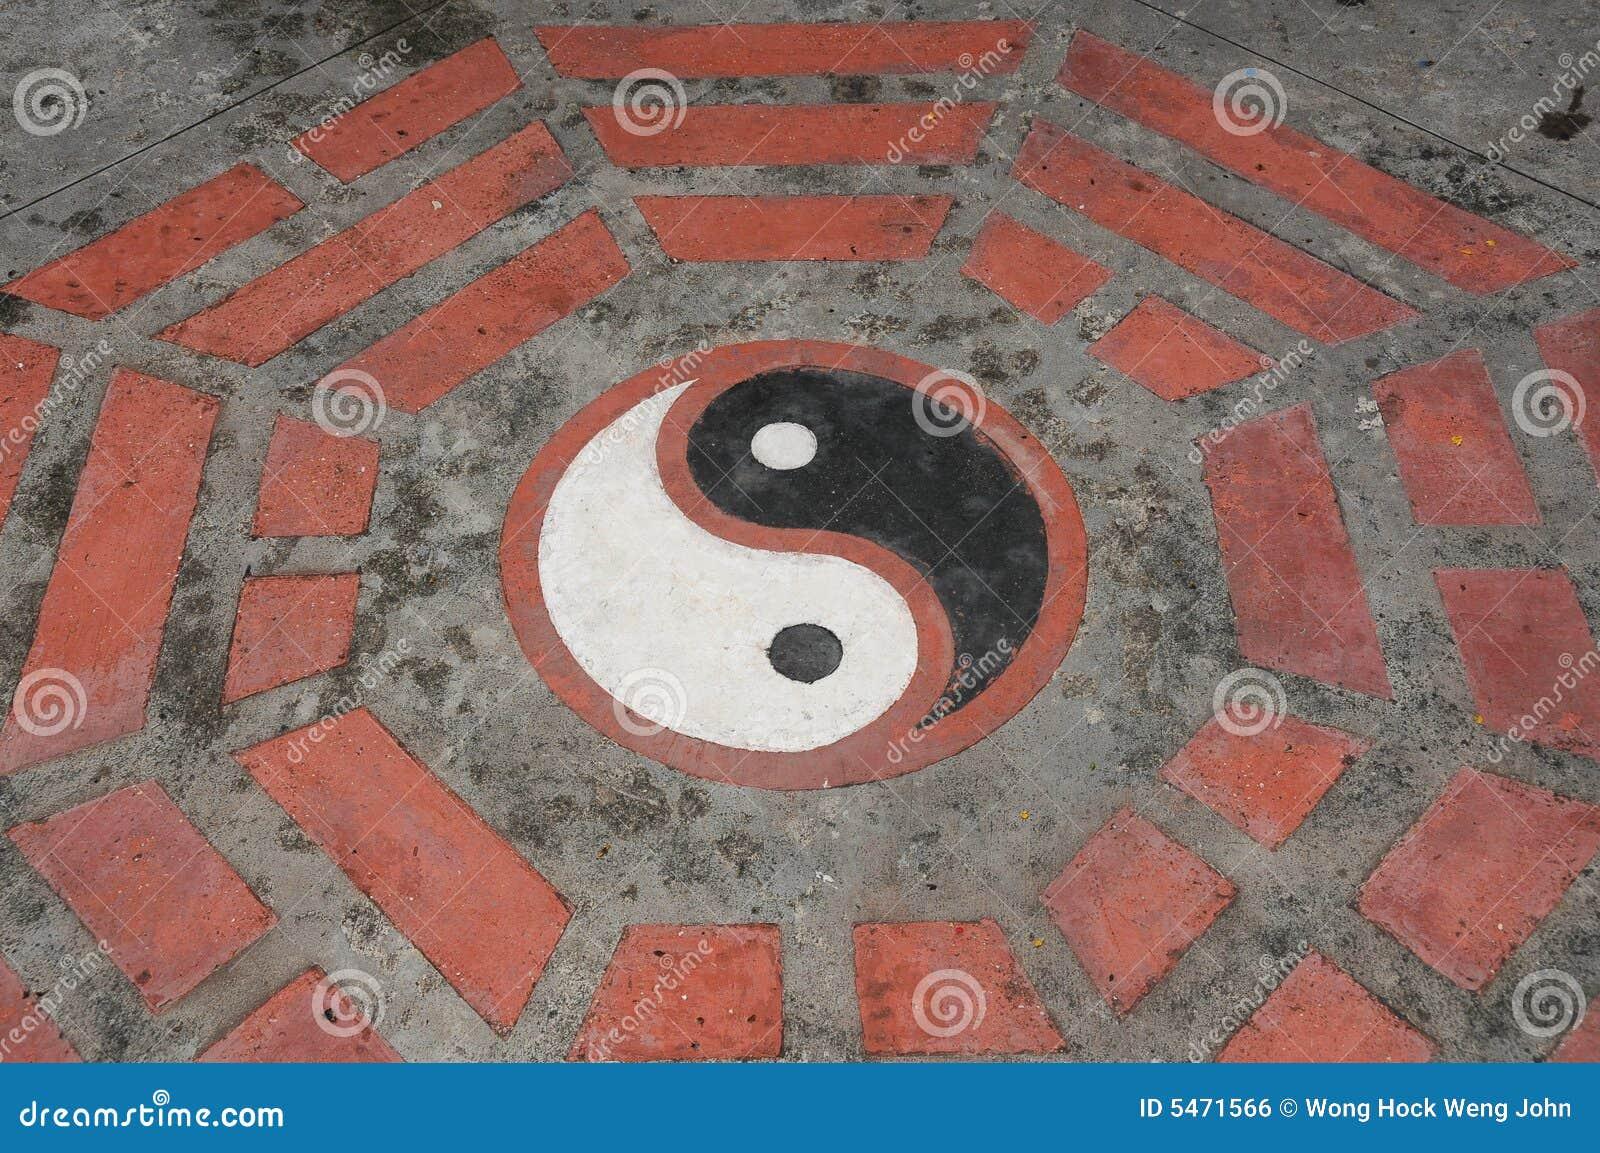 Fußboden John ~ Yin yang symbol auf dem fußboden stockfoto bild von kulturell